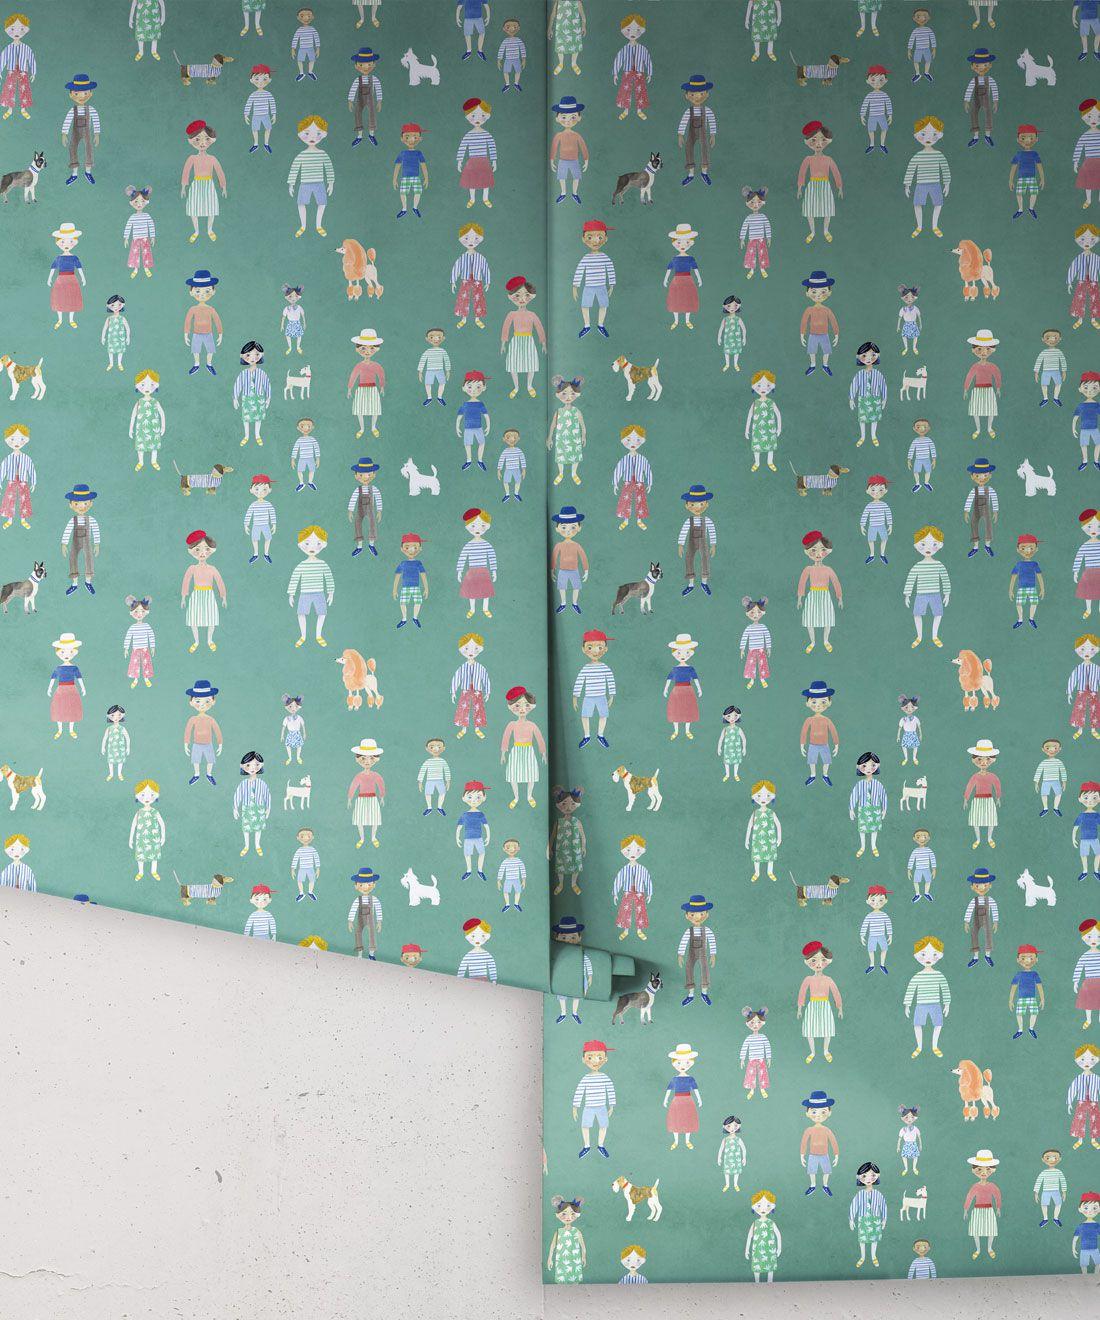 Paper Dolls wallpaper • Turquoise • Rolls